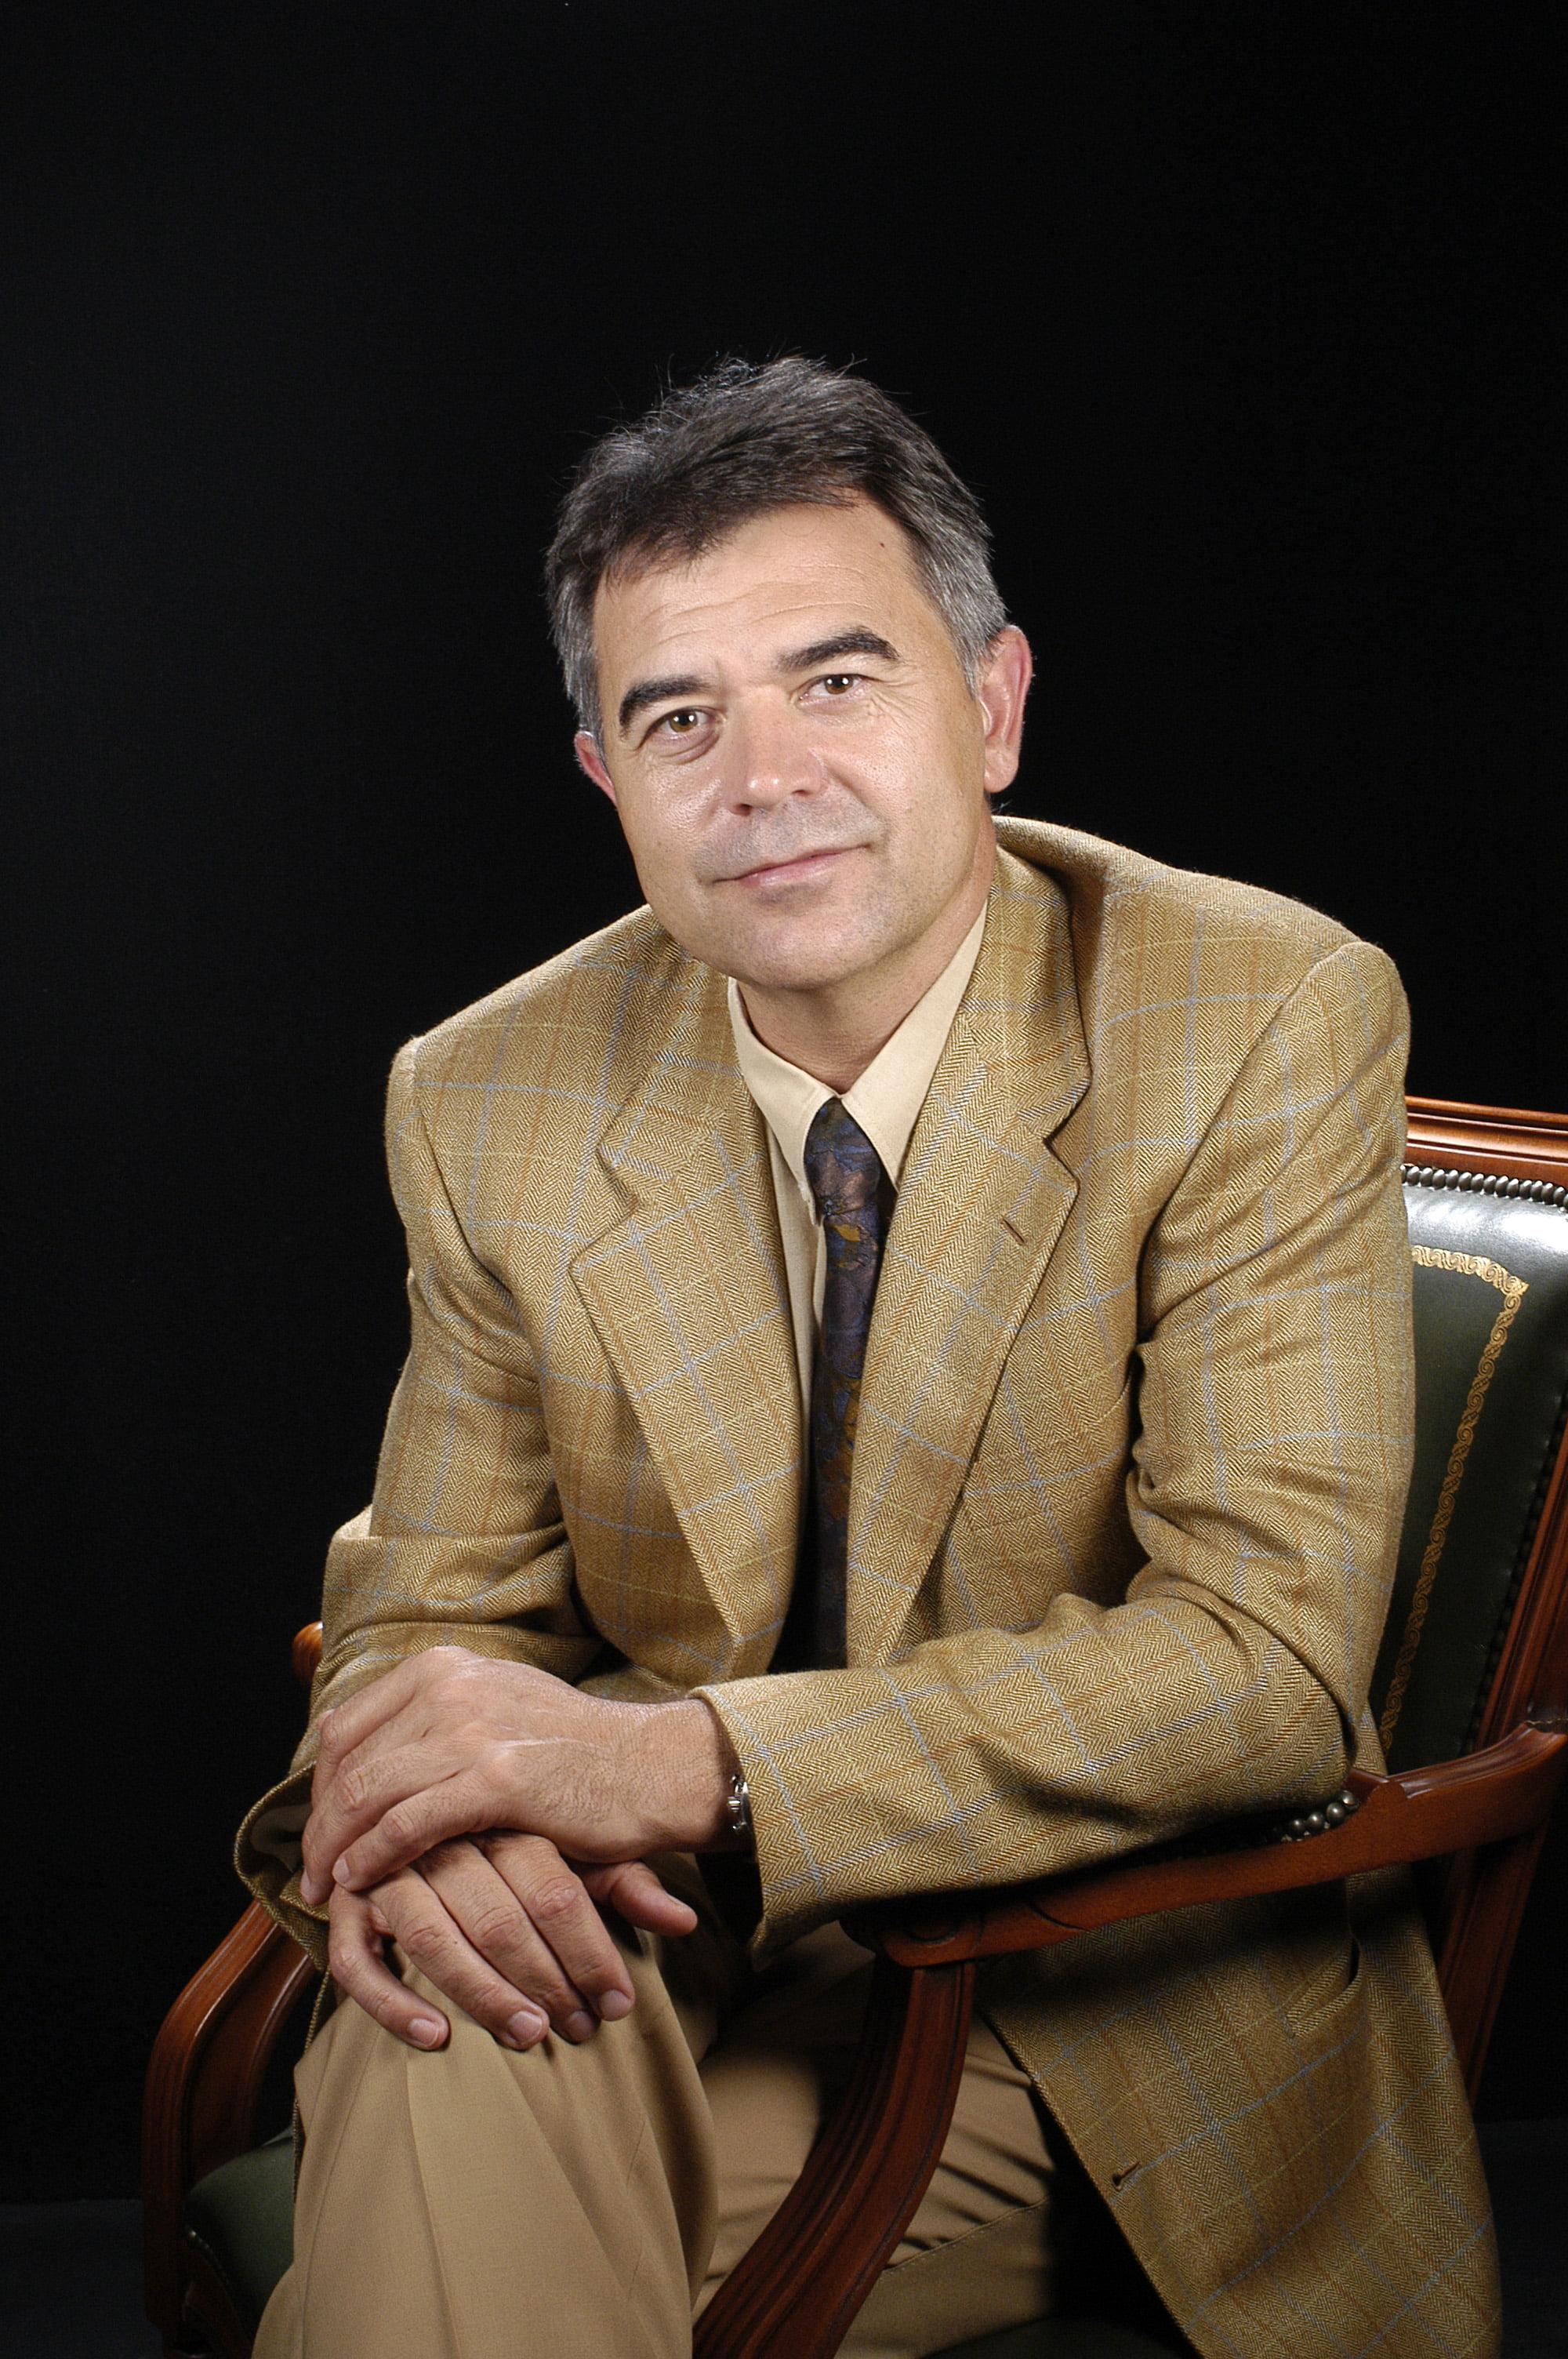 SR. JOSEP PANYELLA PUJADÓ